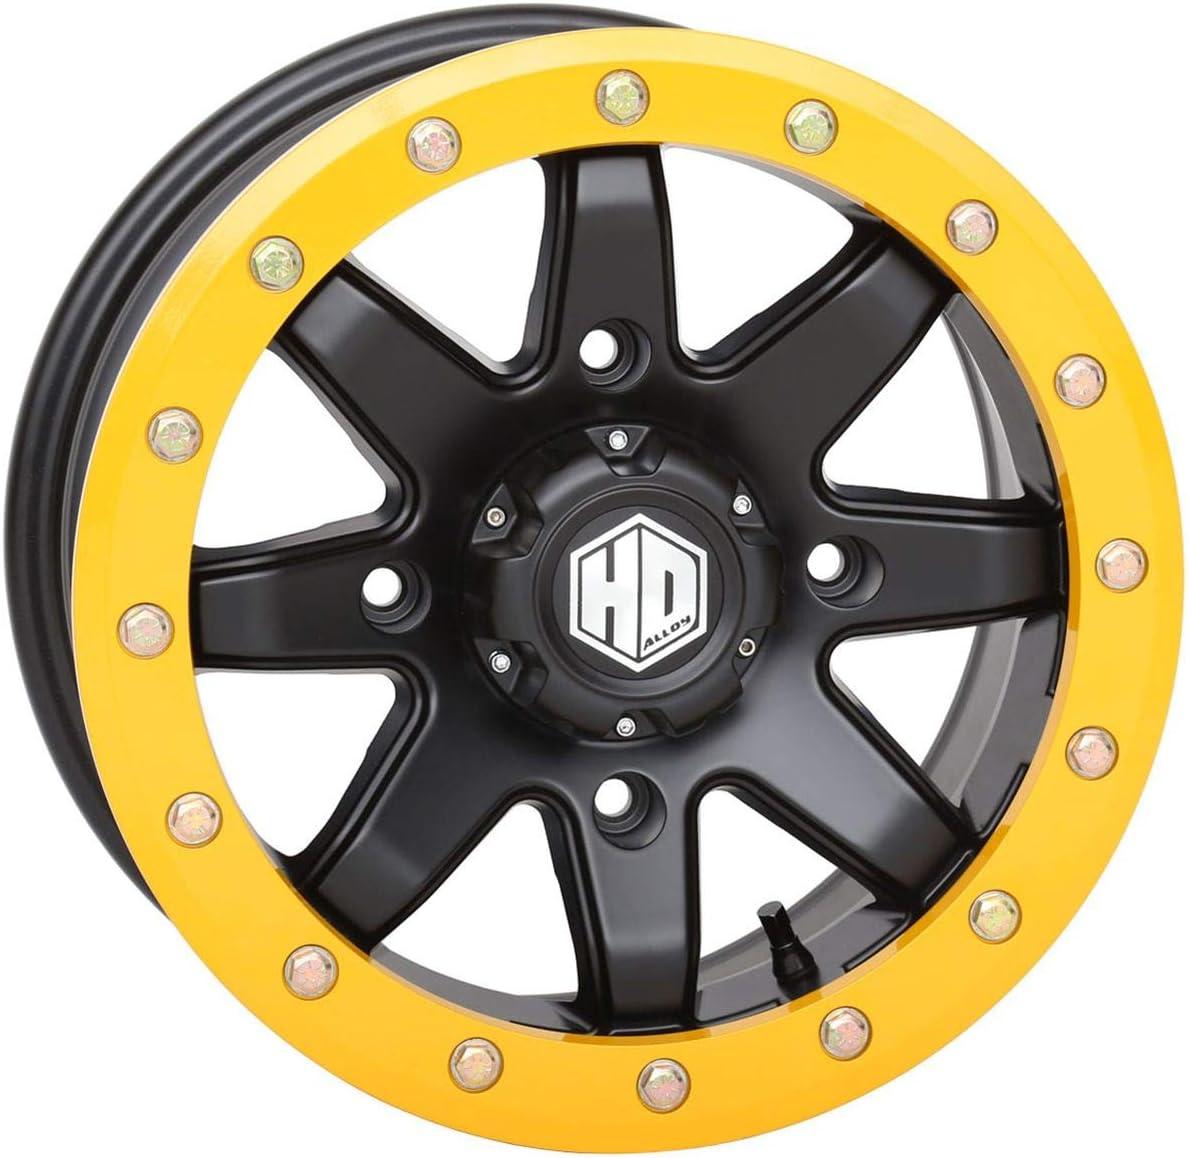 STI HD9 激安通販専門店 A1 Replacement Beadlock Ring Yellow 高級